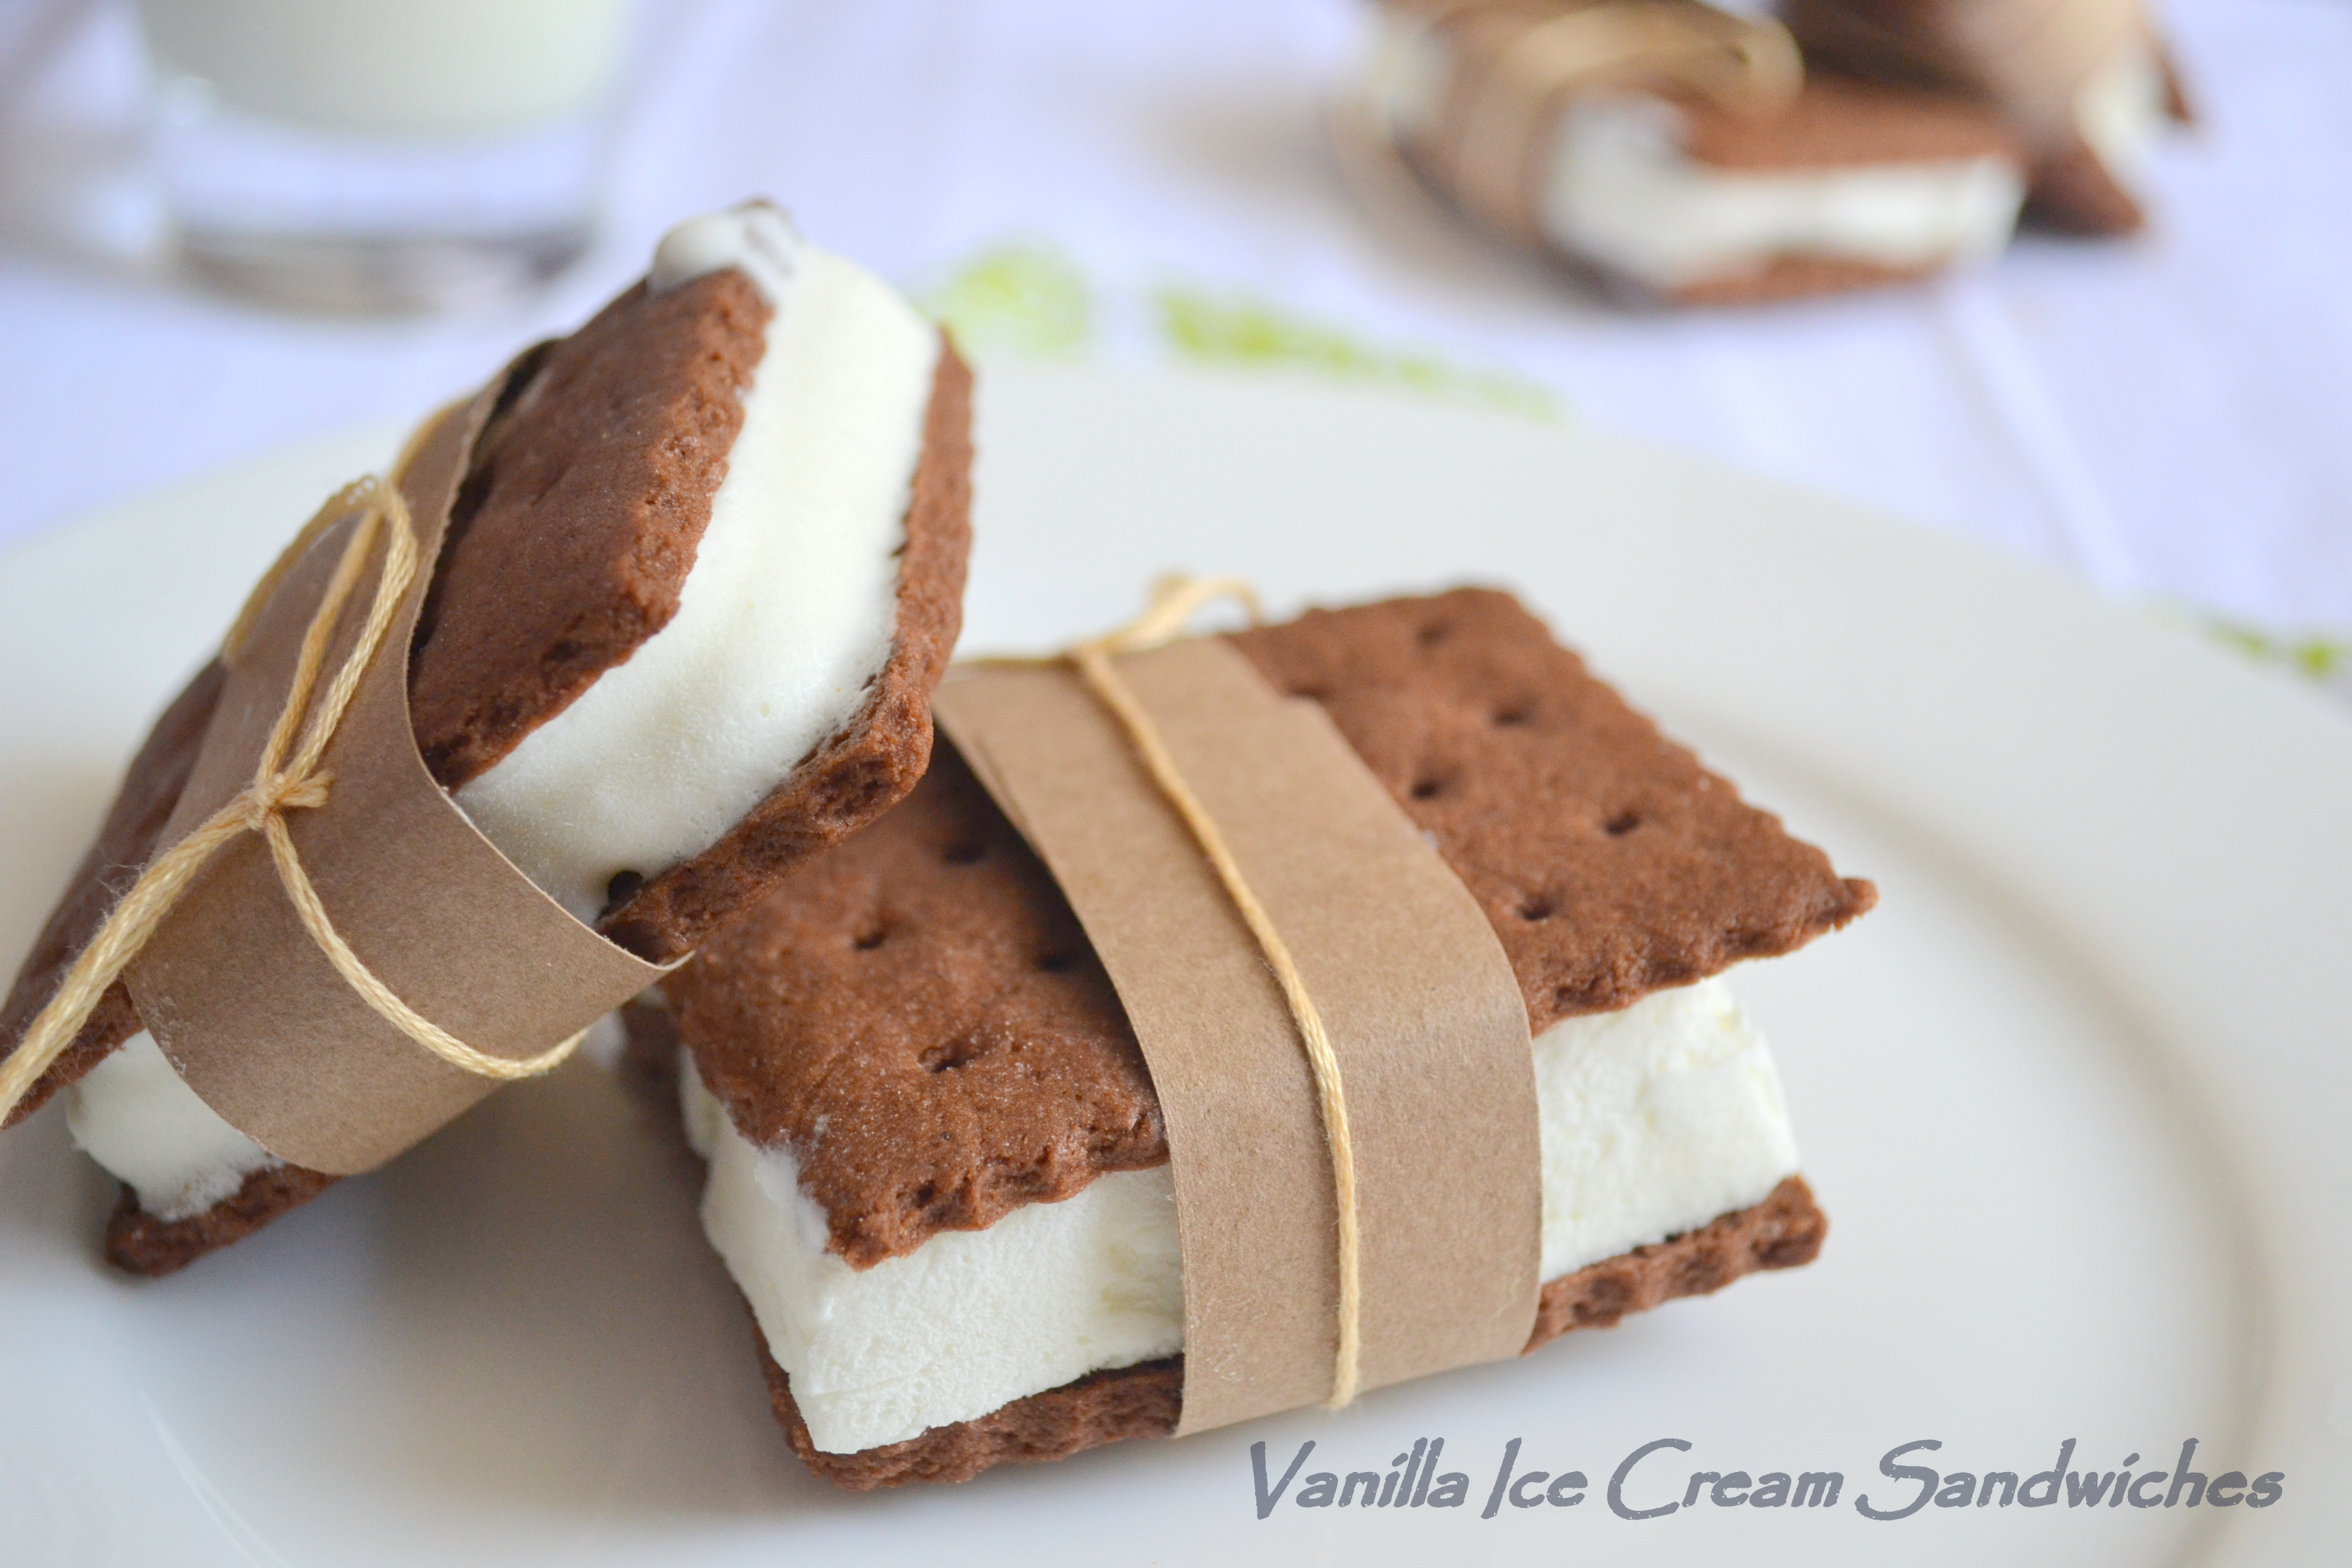 Vanilla Ice Cream Sandwiches - The White Ramekins